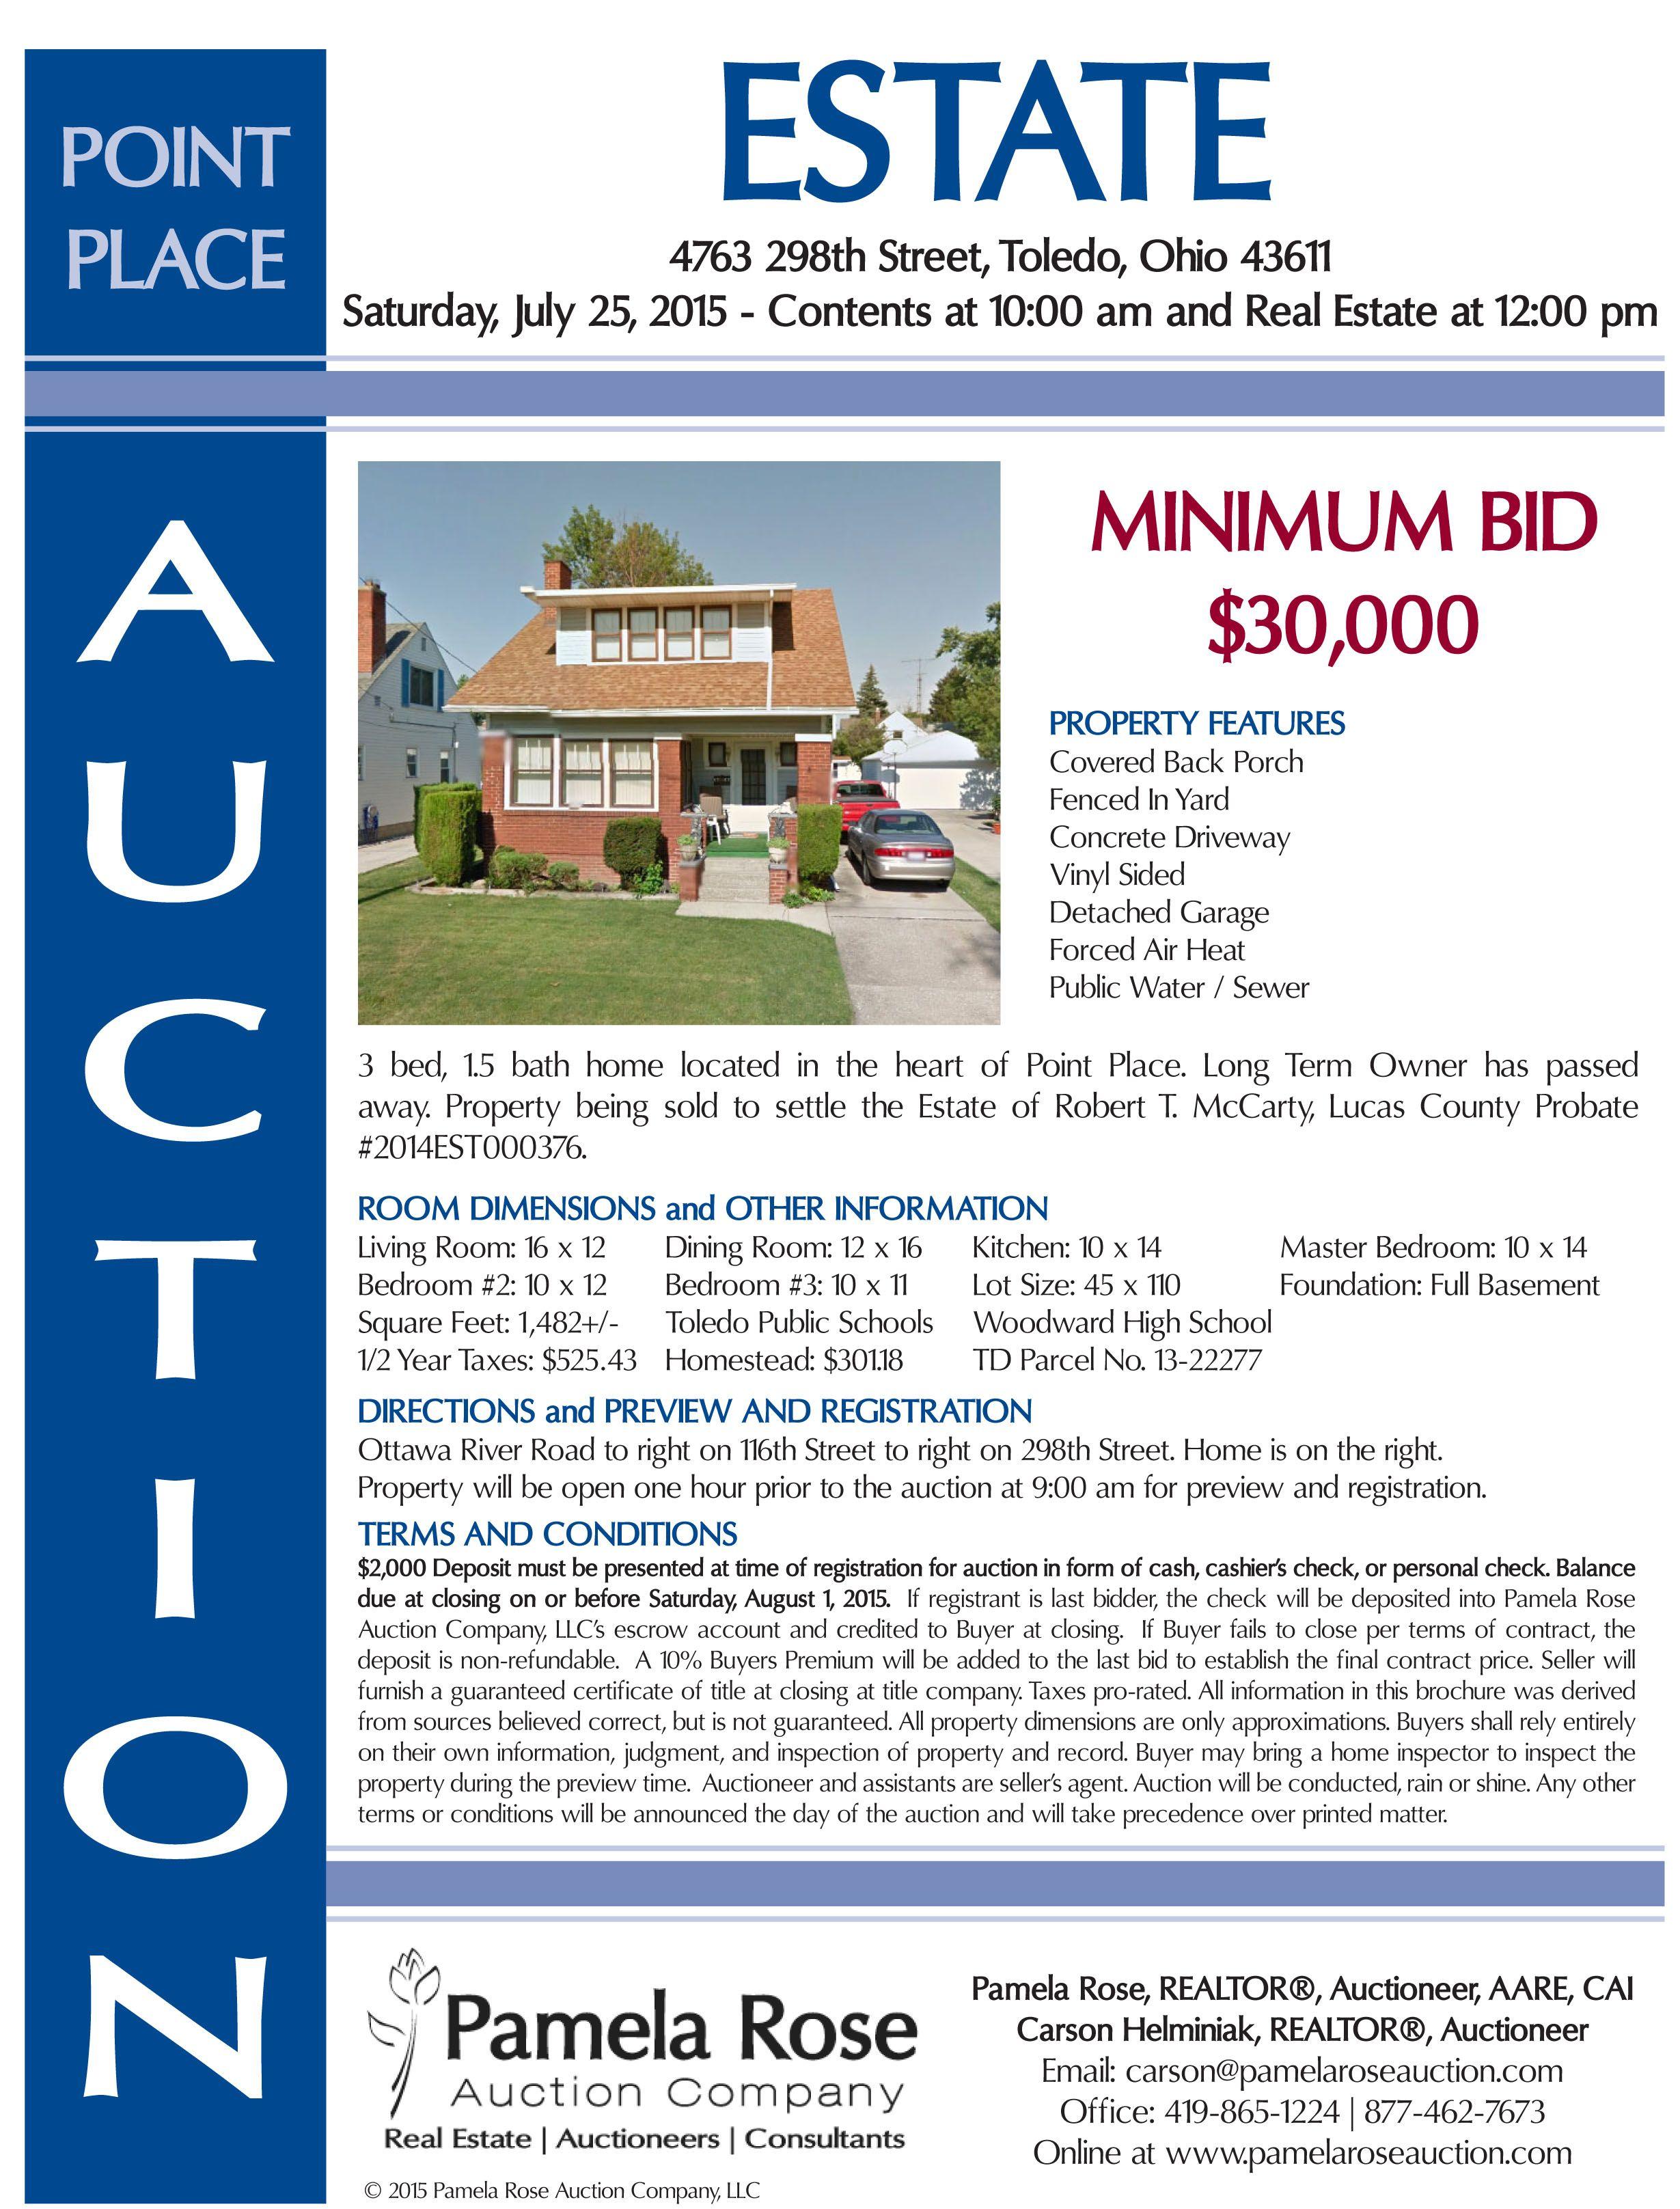 Estate auction in point place minimum bid 30000 at